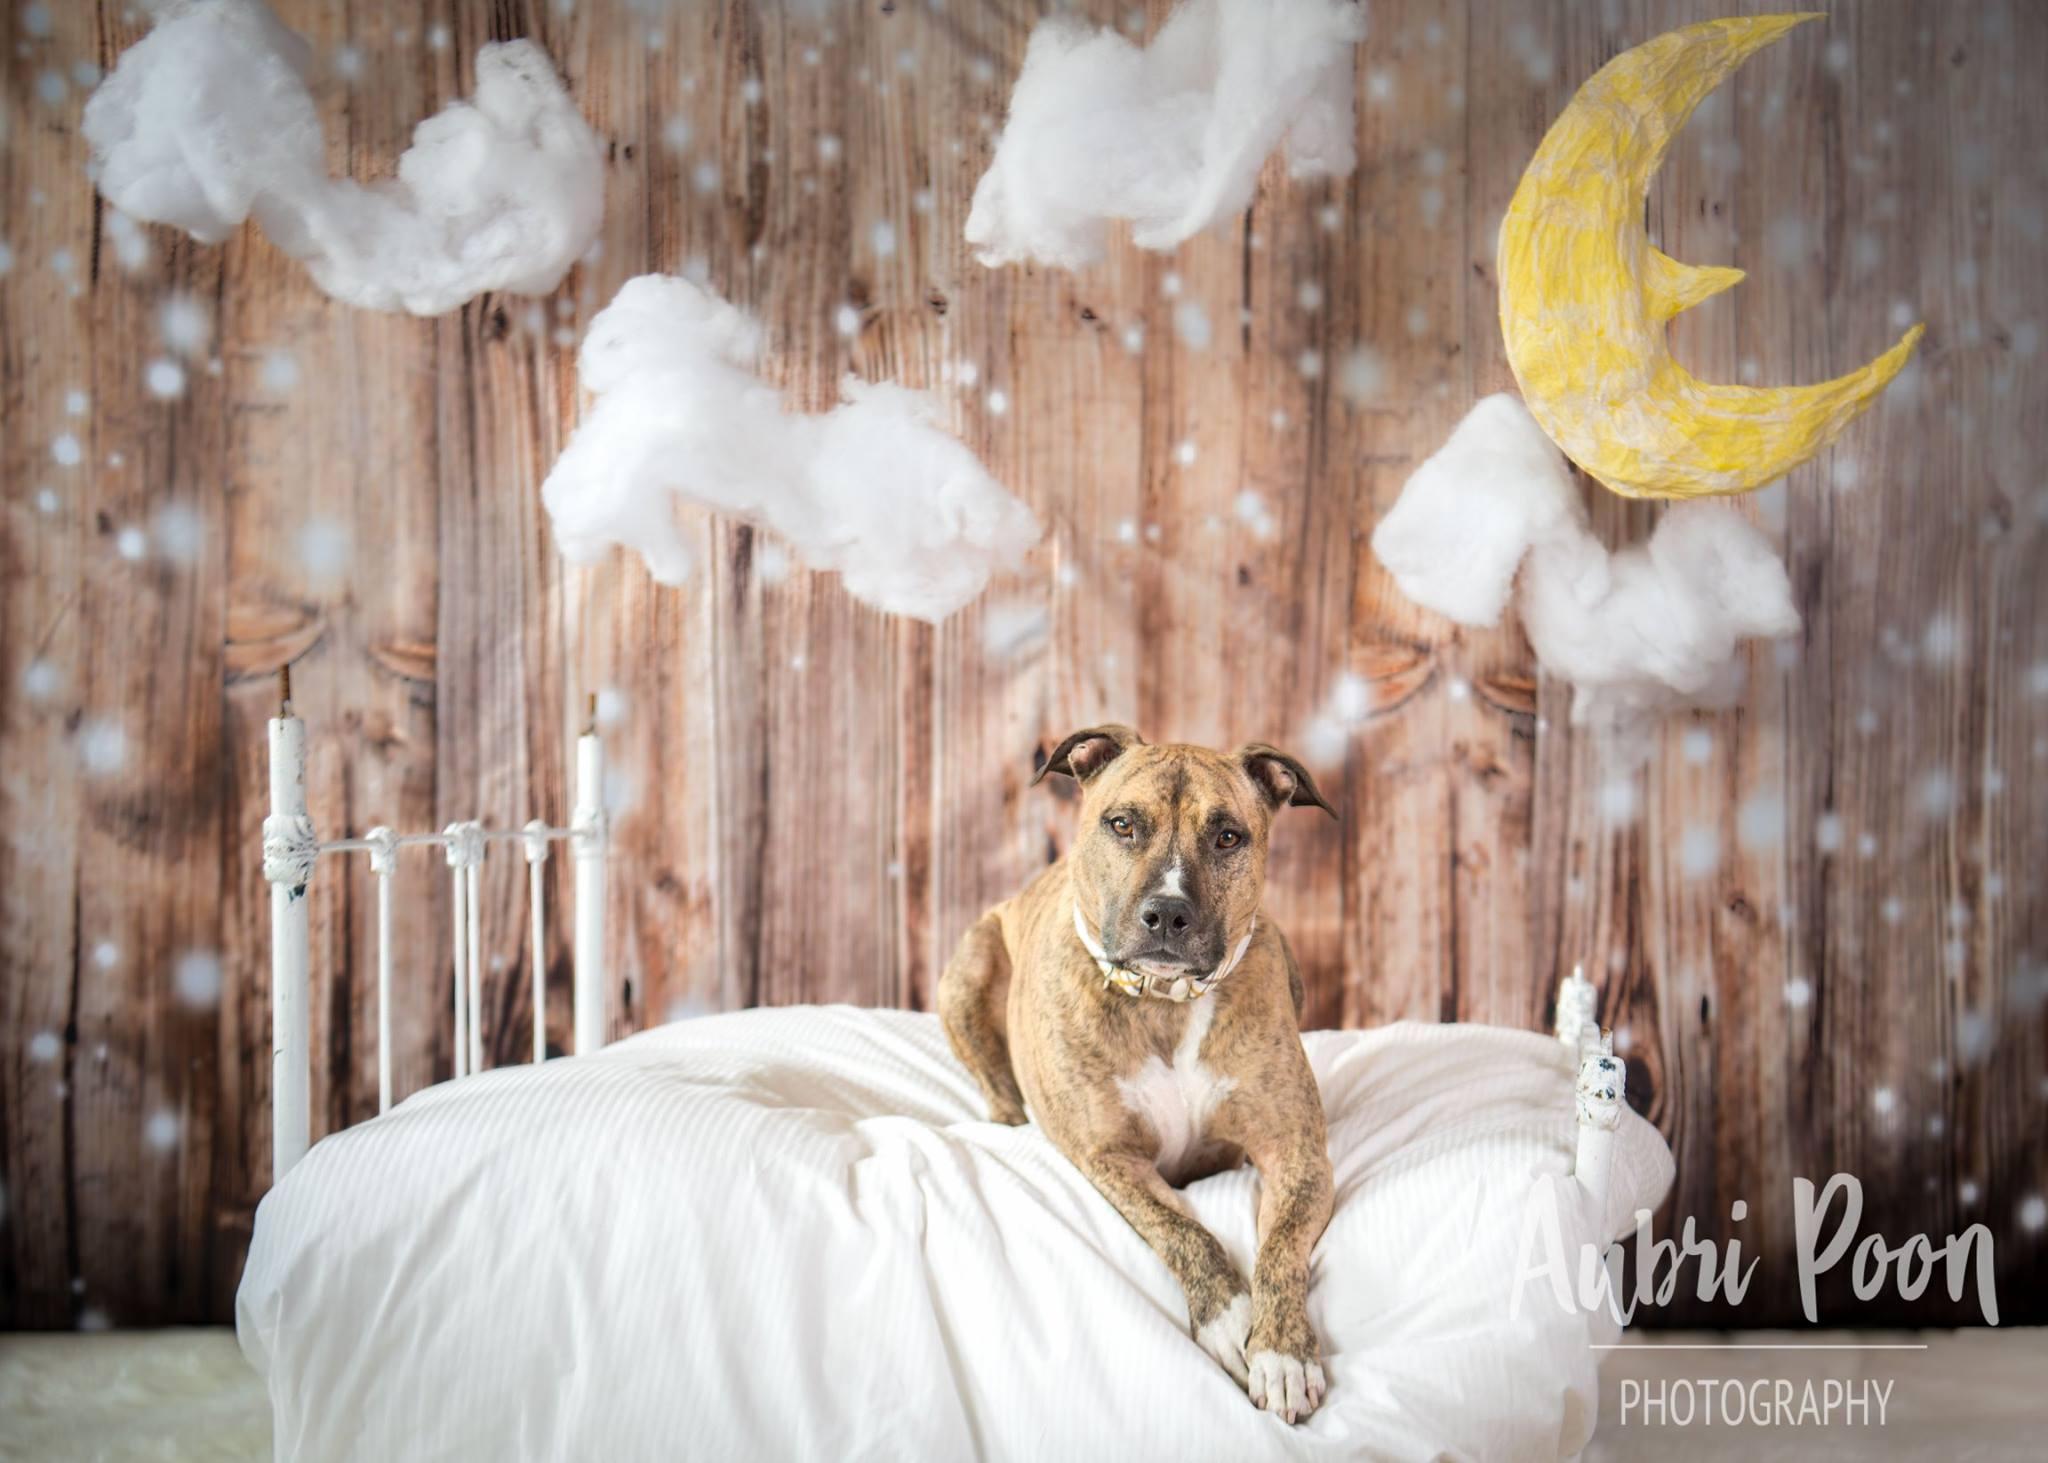 HEY! Wanna Sleep Rover? Shogun and his Happy 7th Birthday Photoshoot with Aubri Poon Photography.